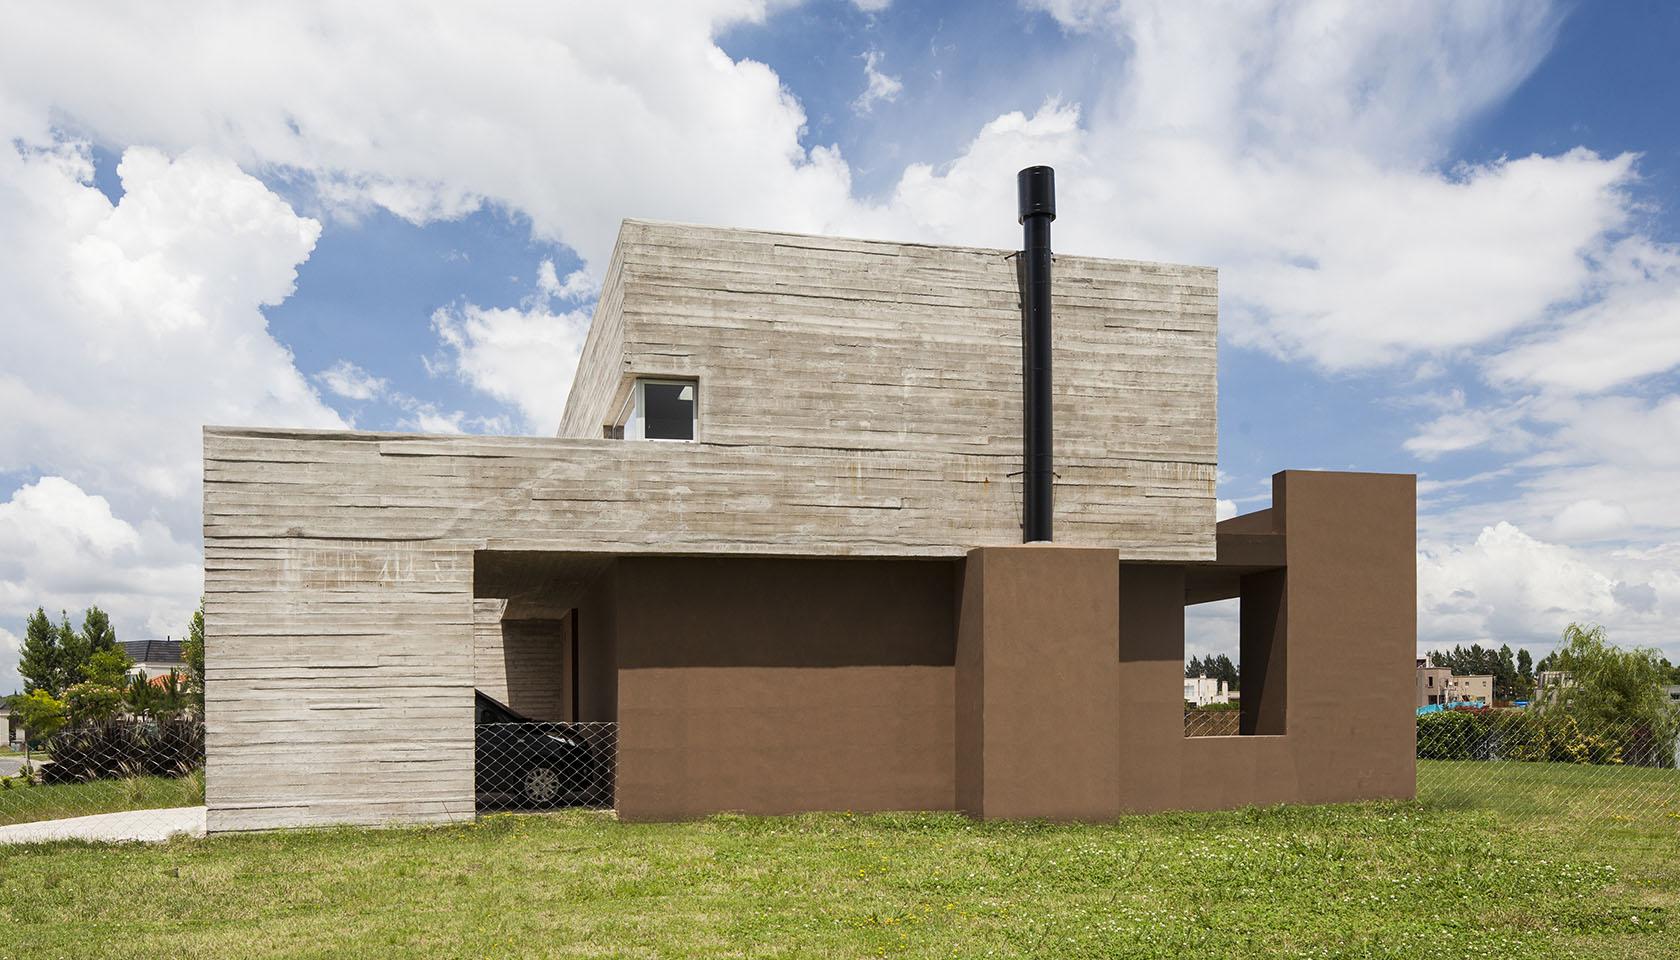 Hormigo y revoque, fachadas modernas, arquitectura contemporánea